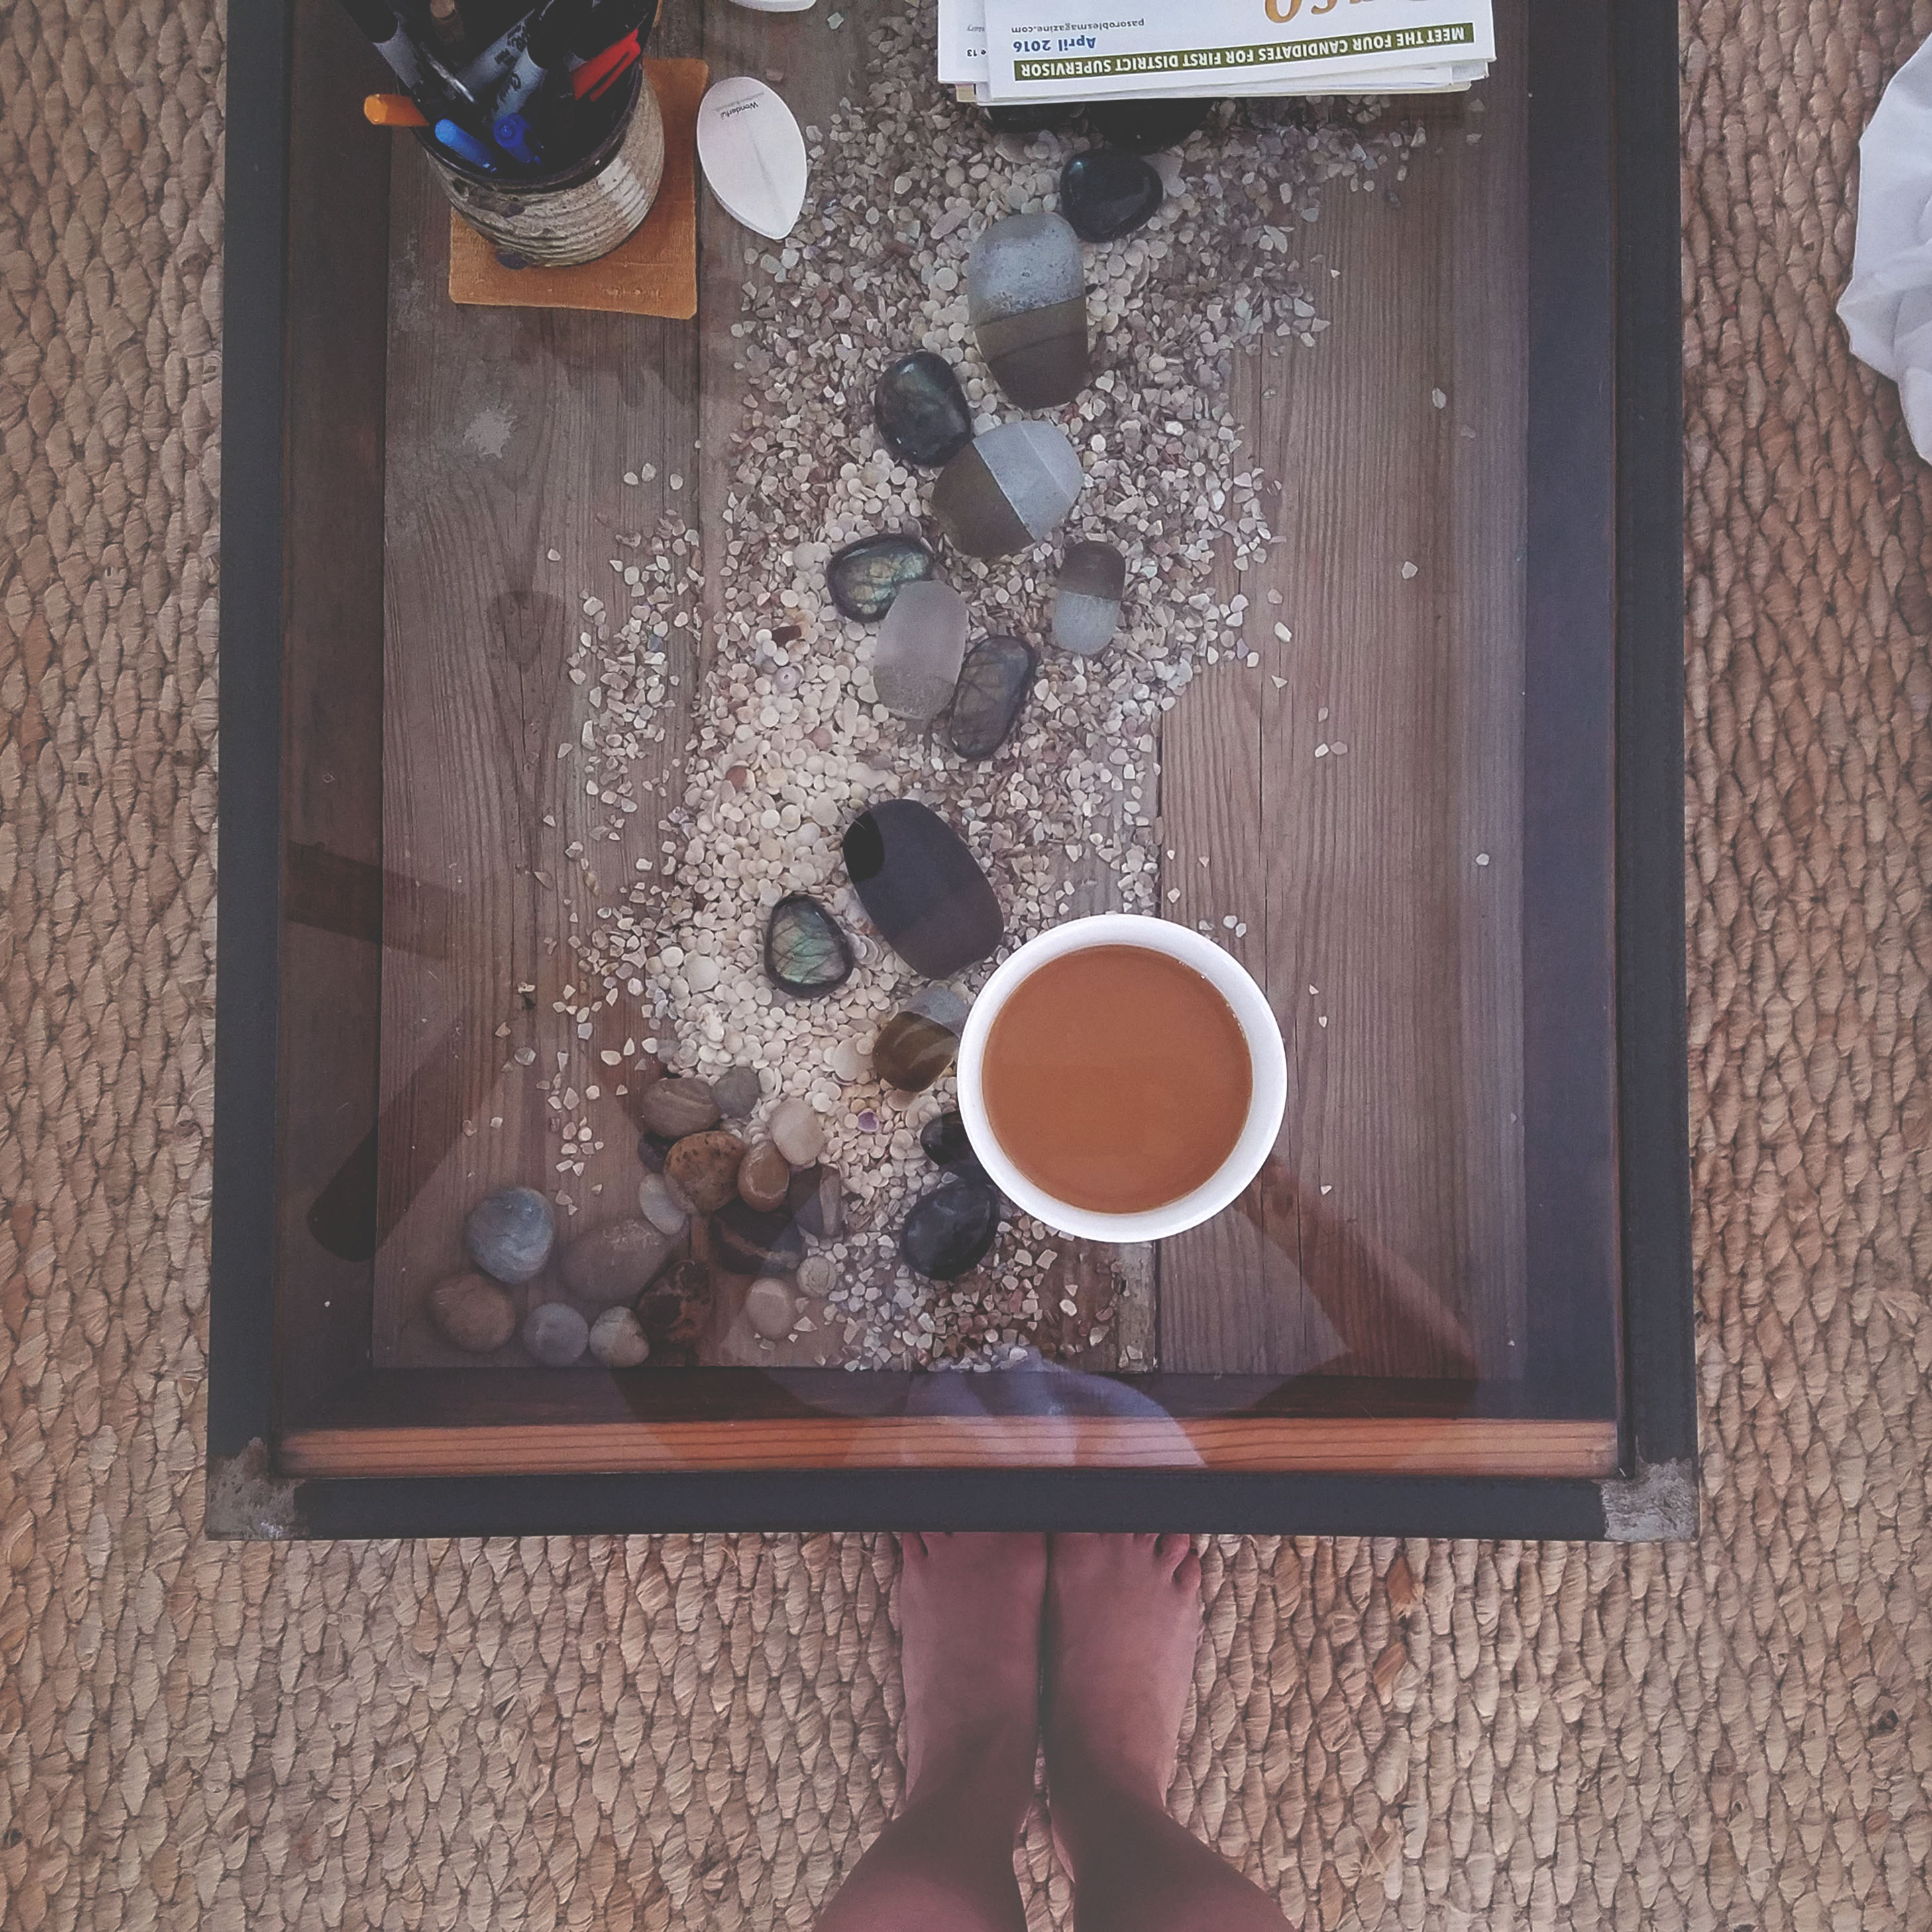 my morning coffee bowl